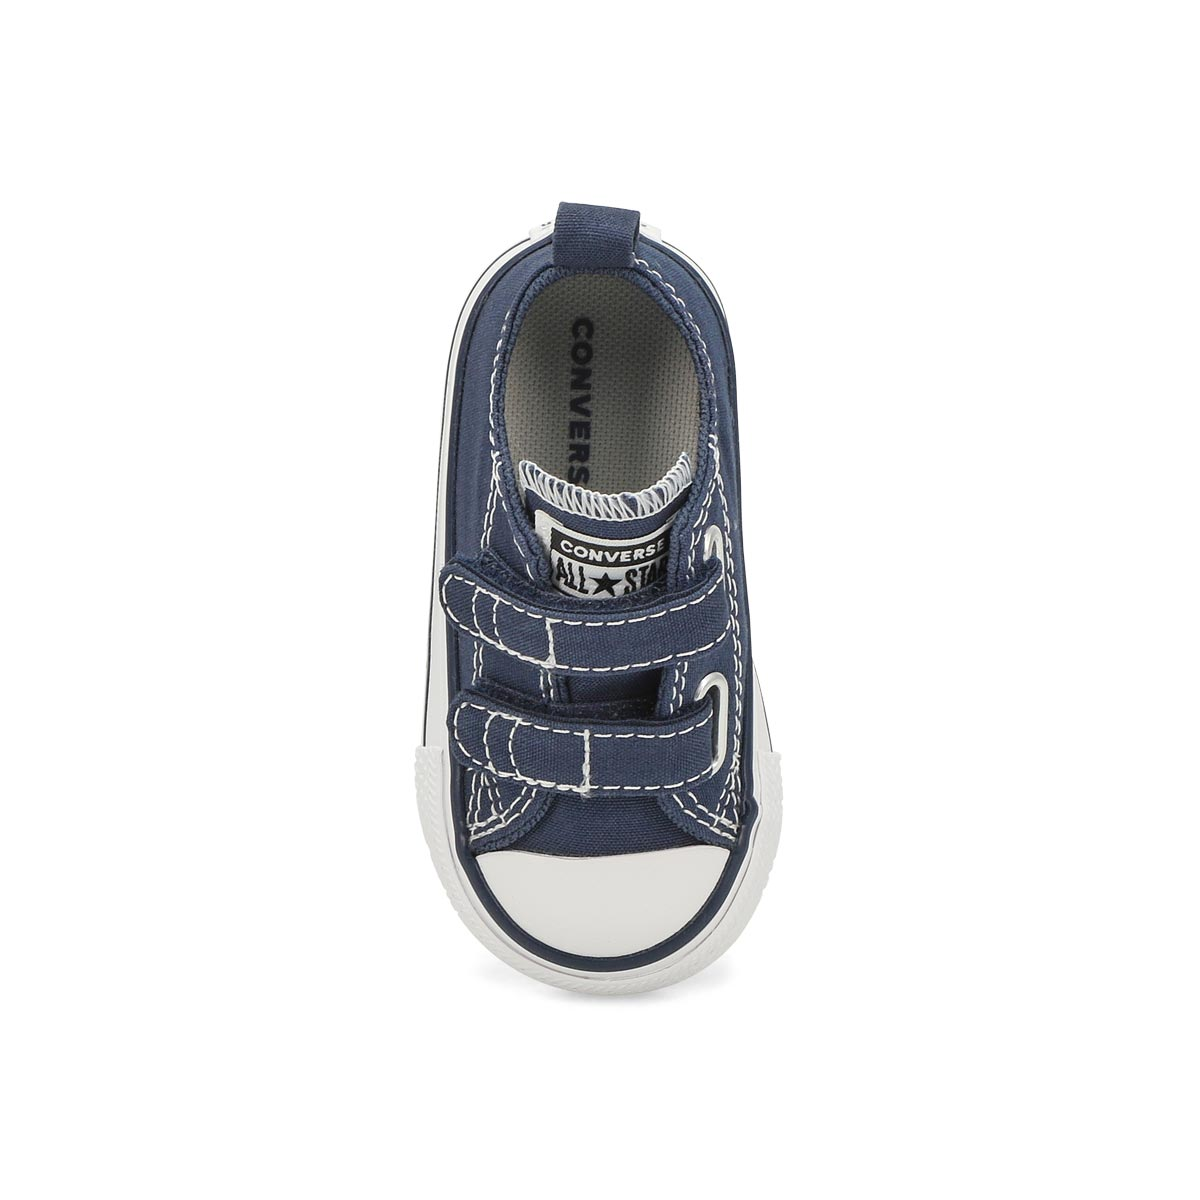 Infs Core V2 Ox navy canvas sneaker